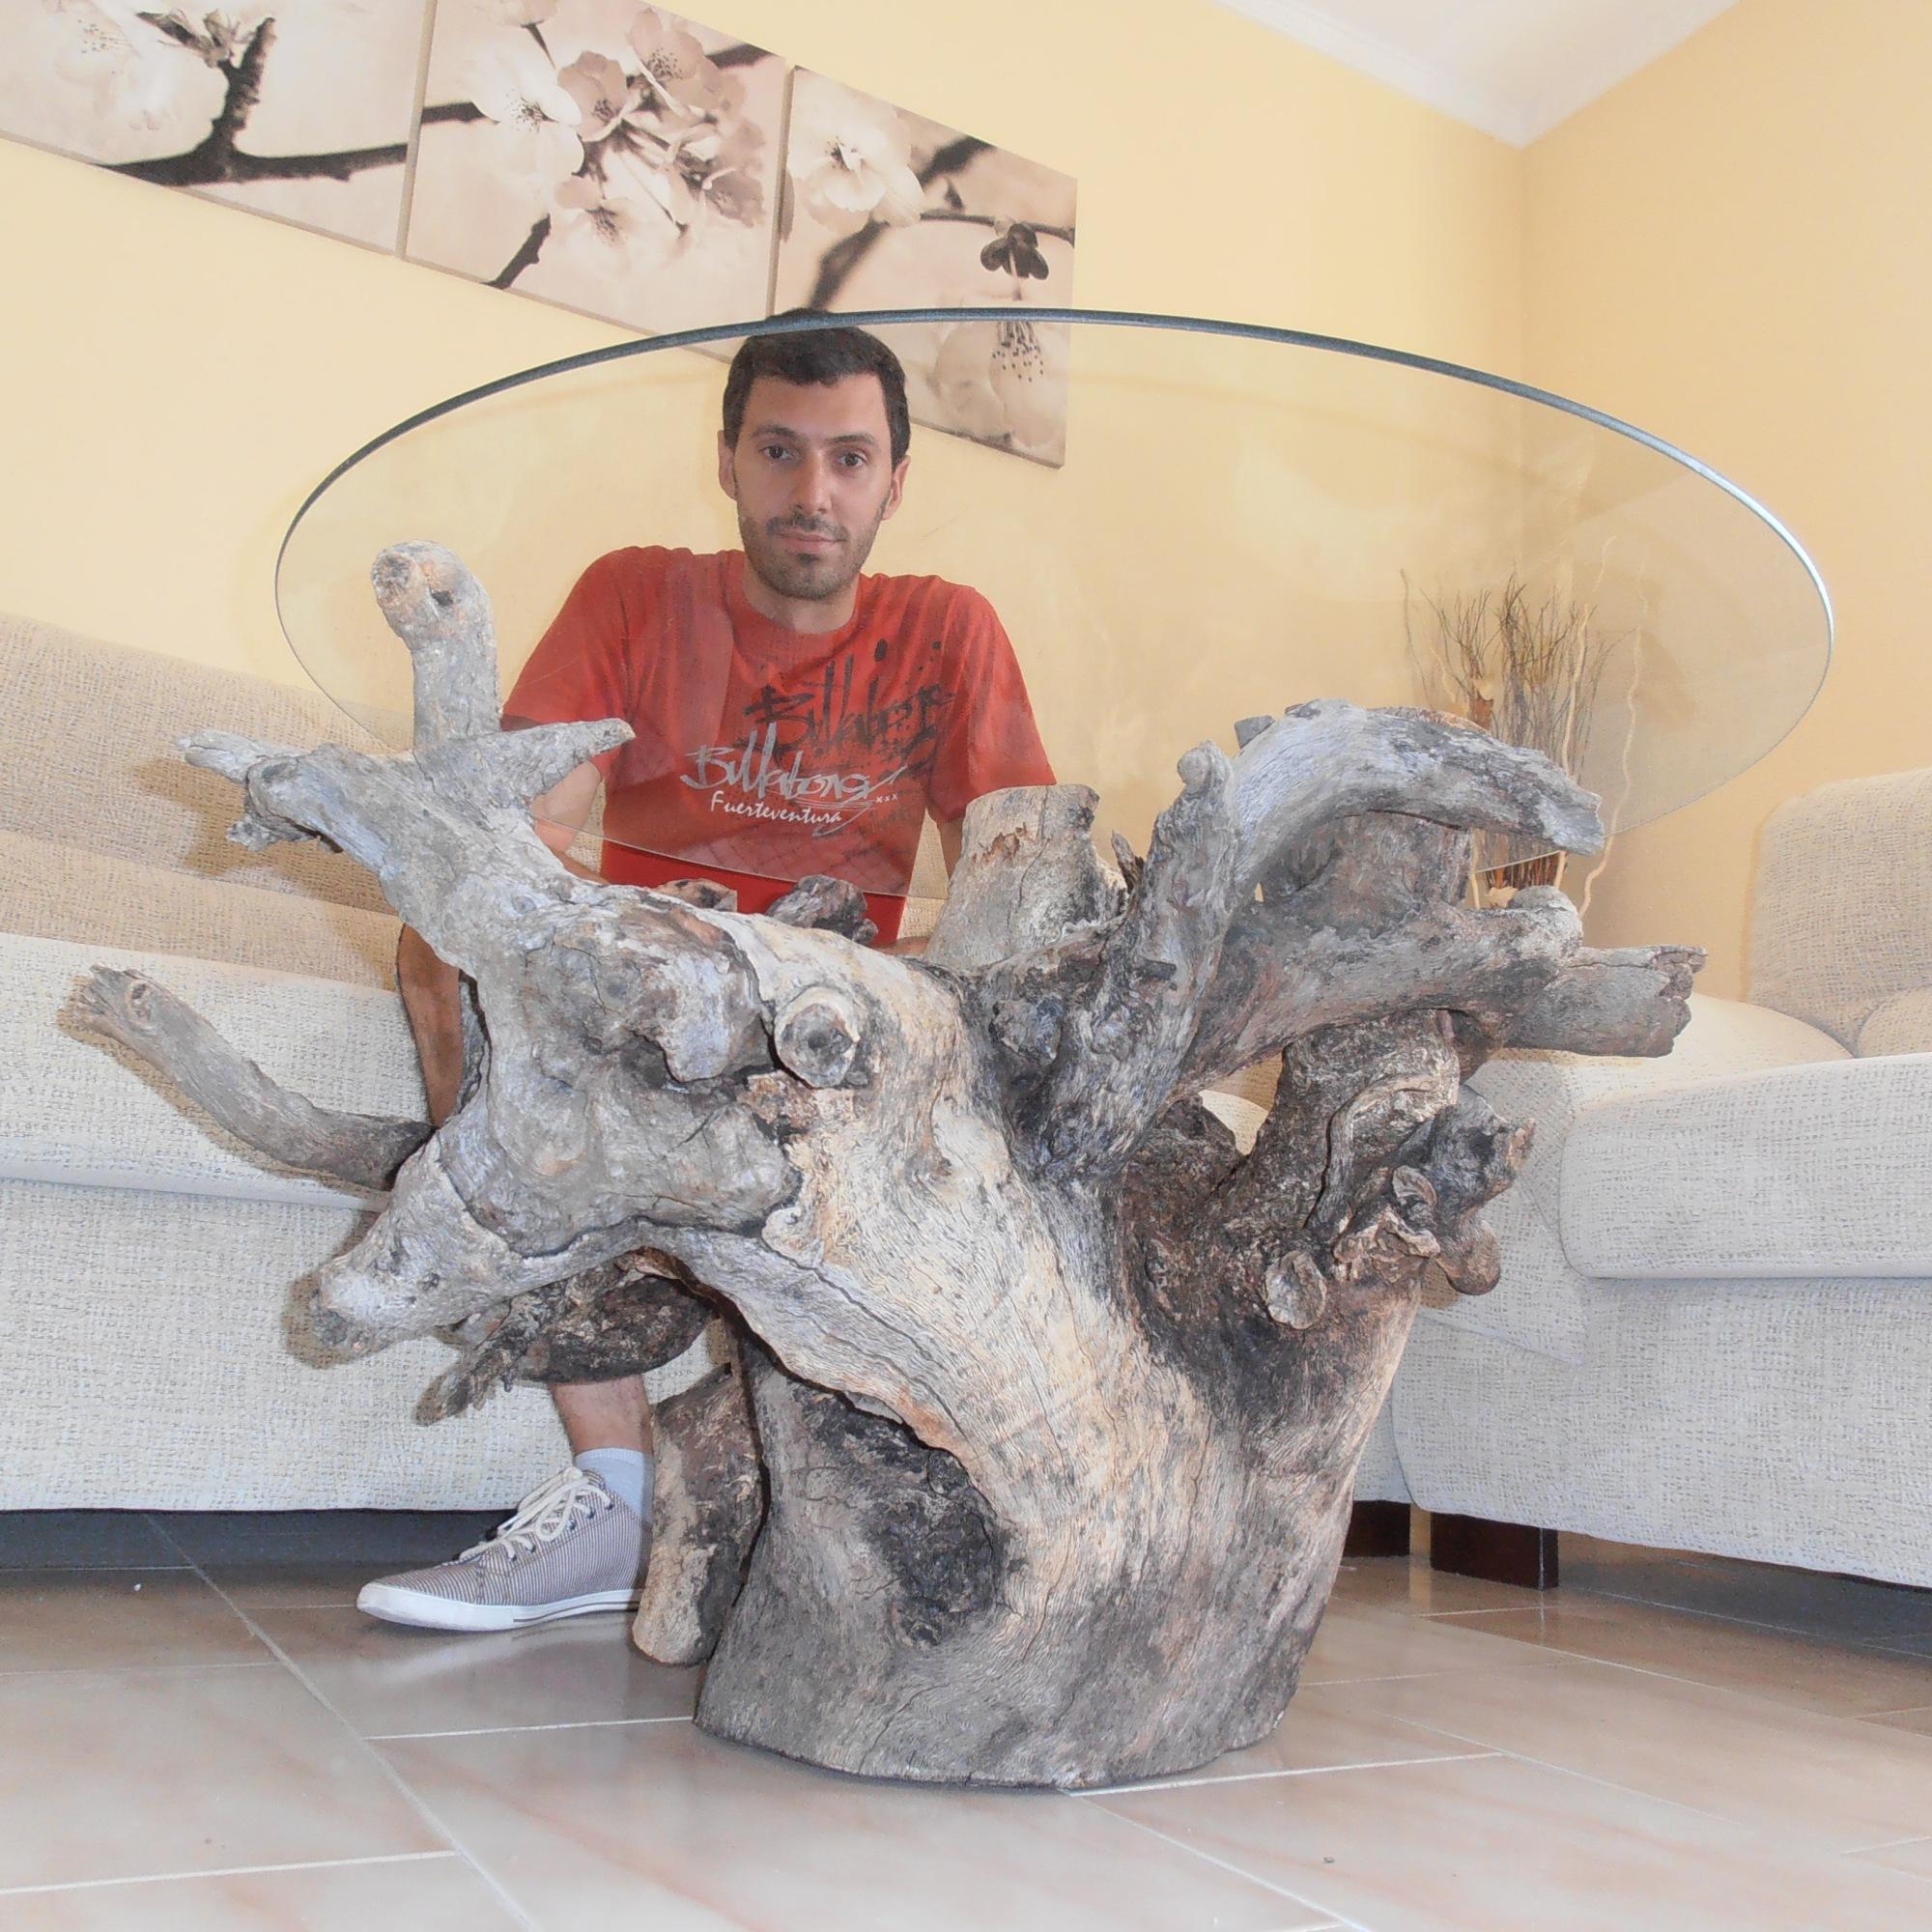 Mesa elaborada con raíces de tronco de encina